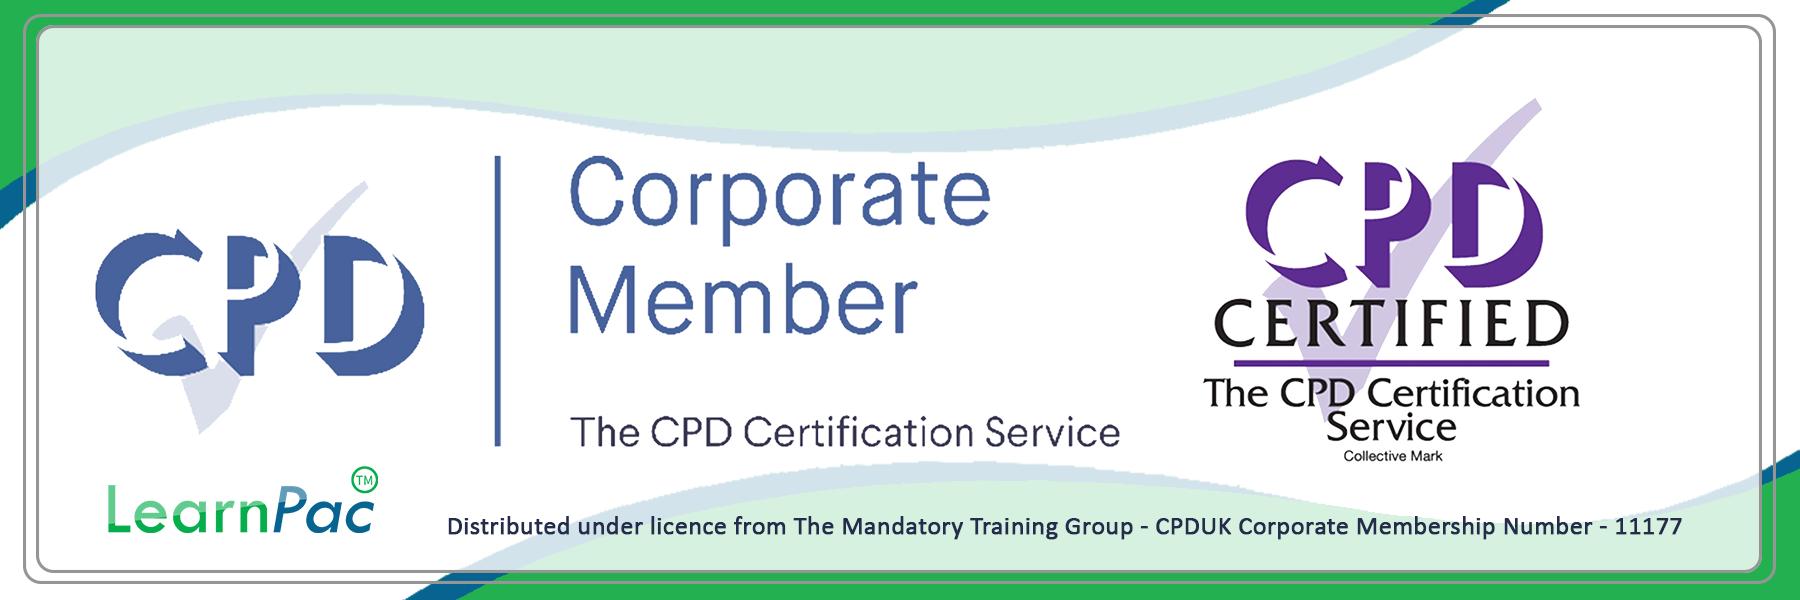 Care Certificate Standard 15 - CPDUK Certified - Learnpac System UK -